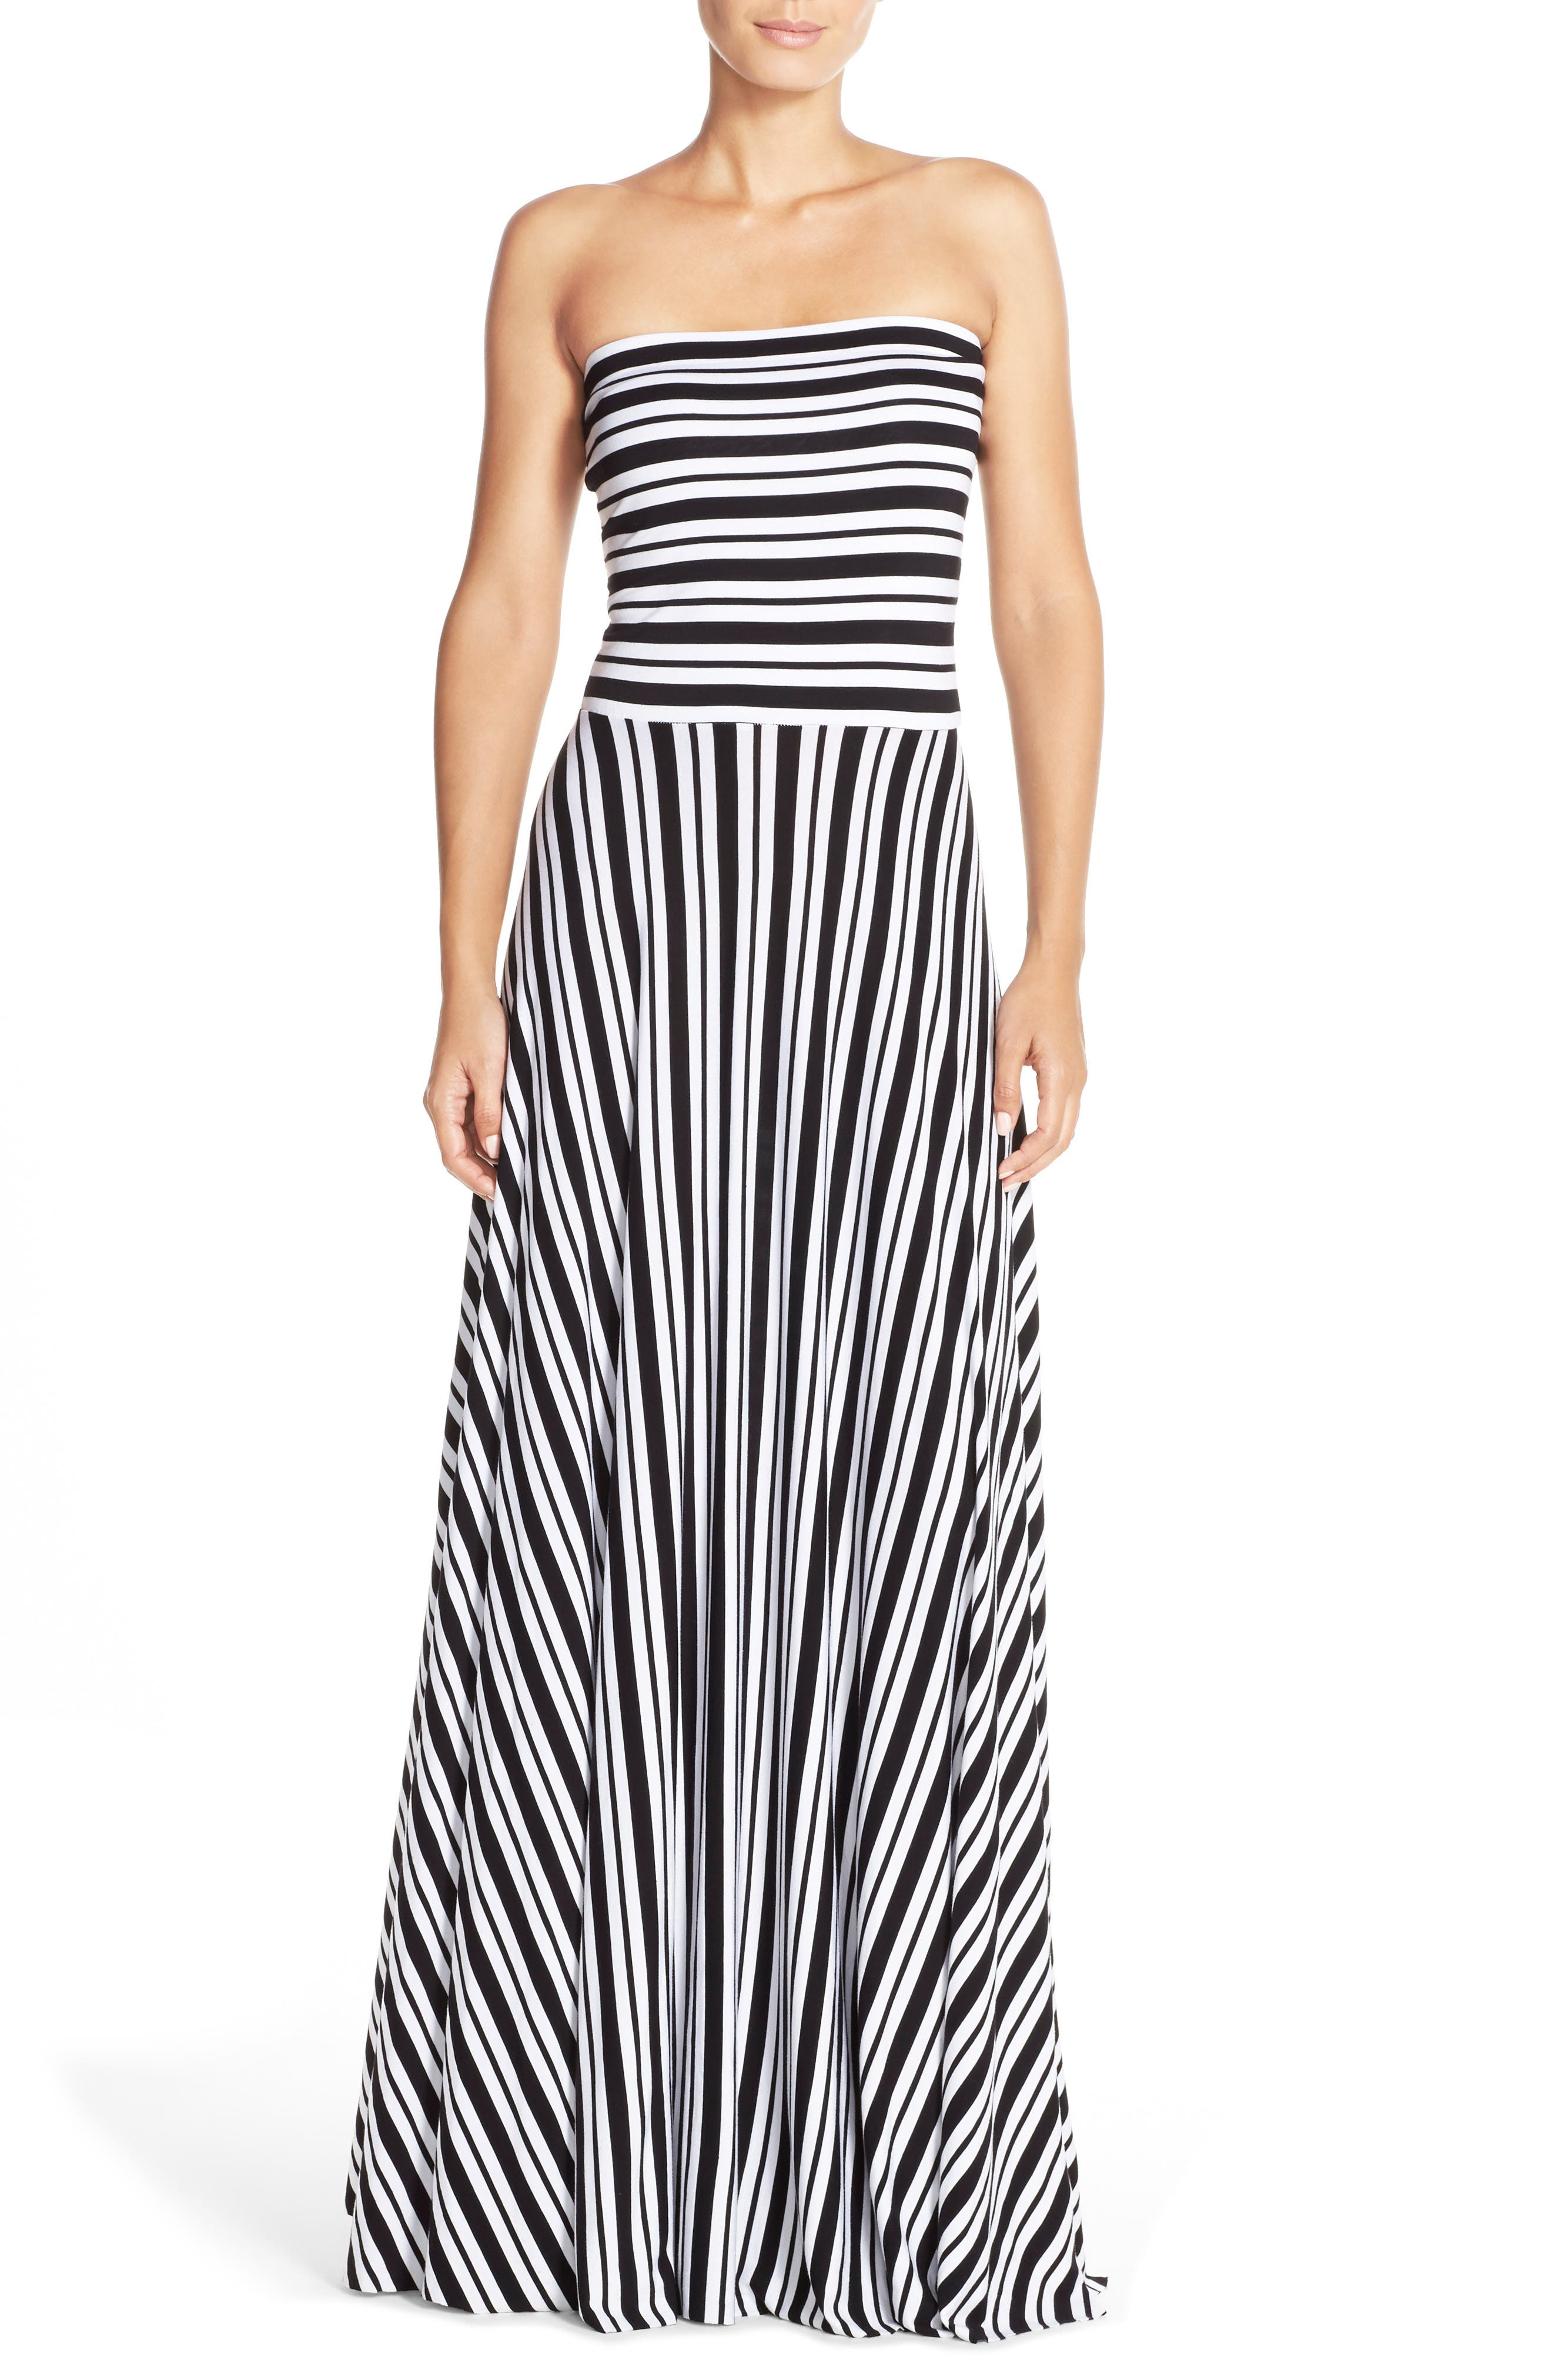 Stripe Strapless Maxi Dress,                             Main thumbnail 1, color,                             Black/ White Stripe